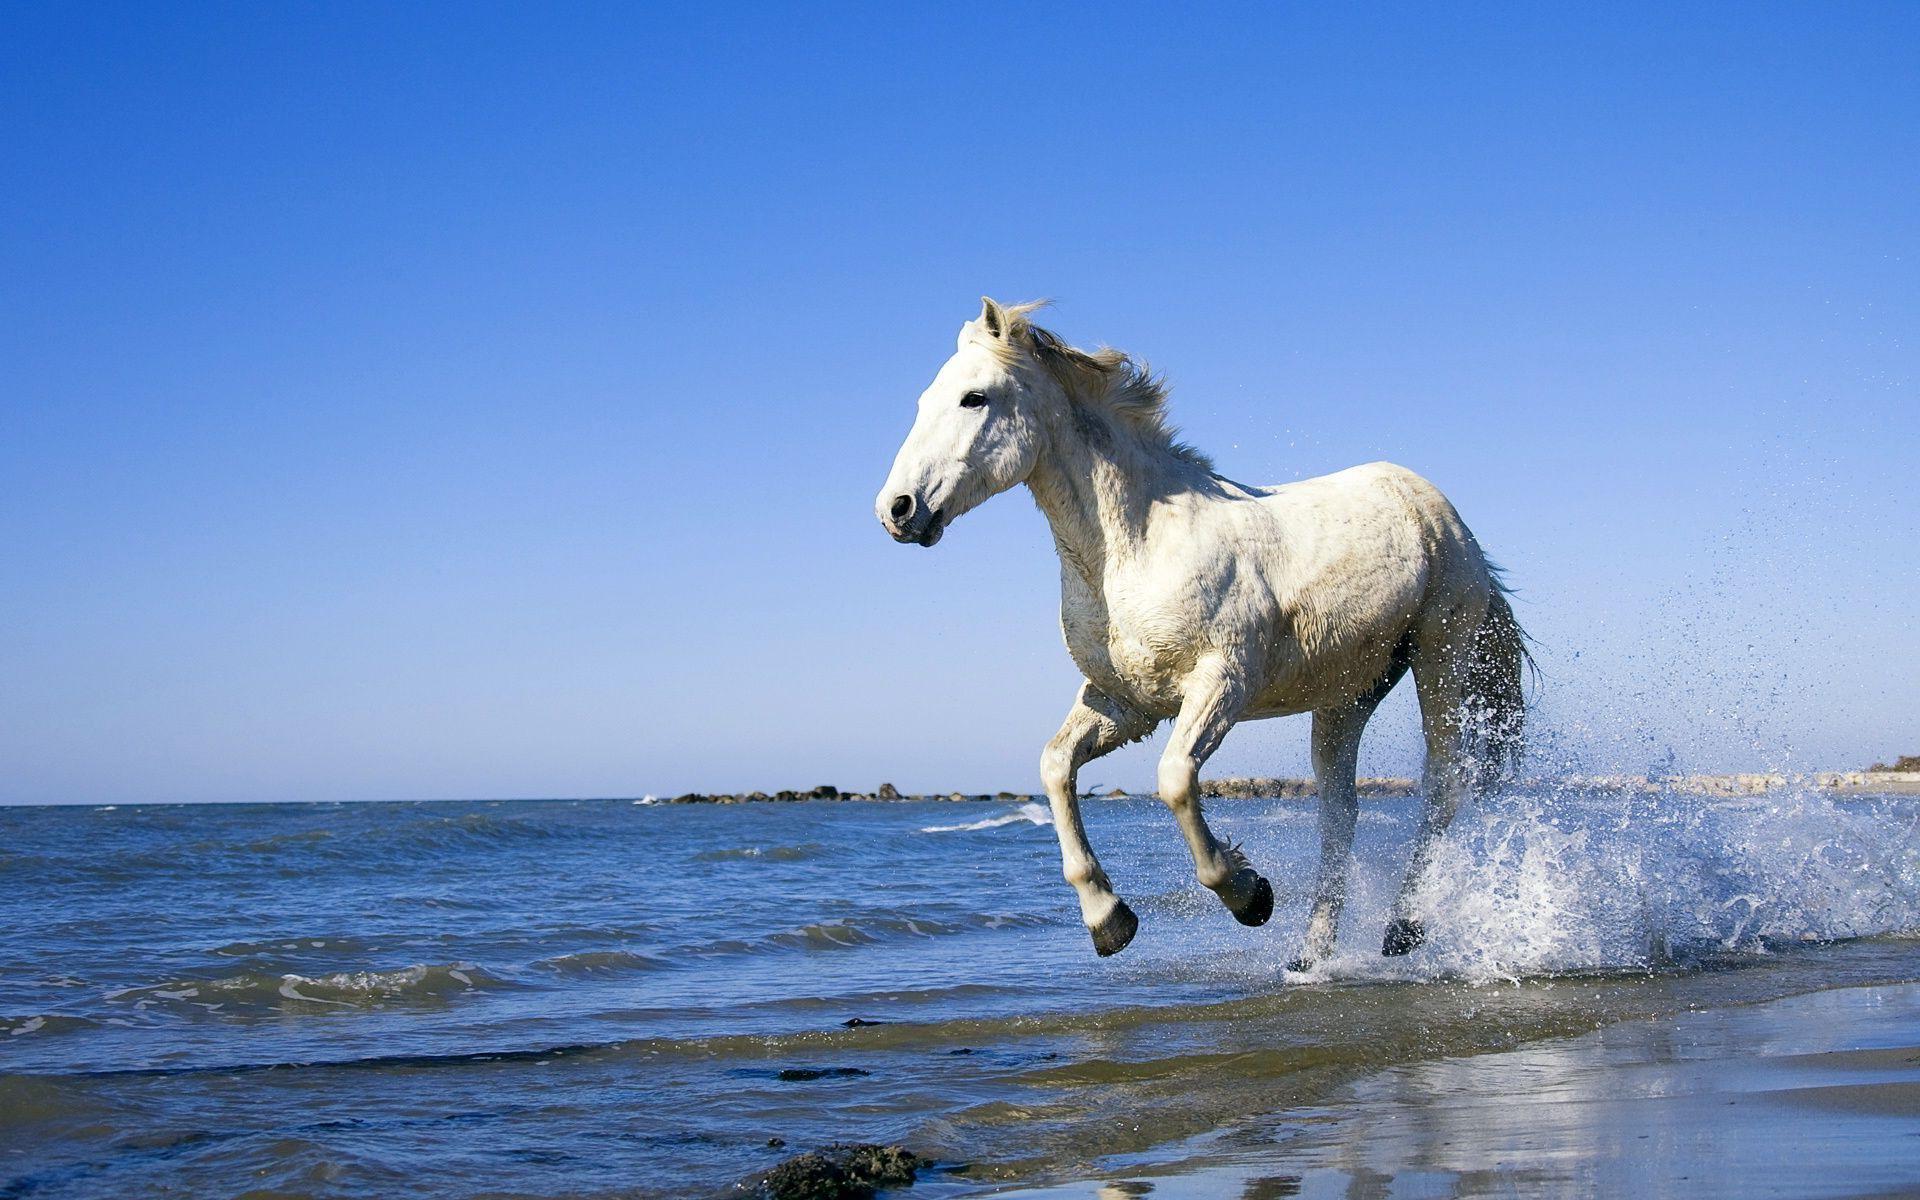 white horse running images